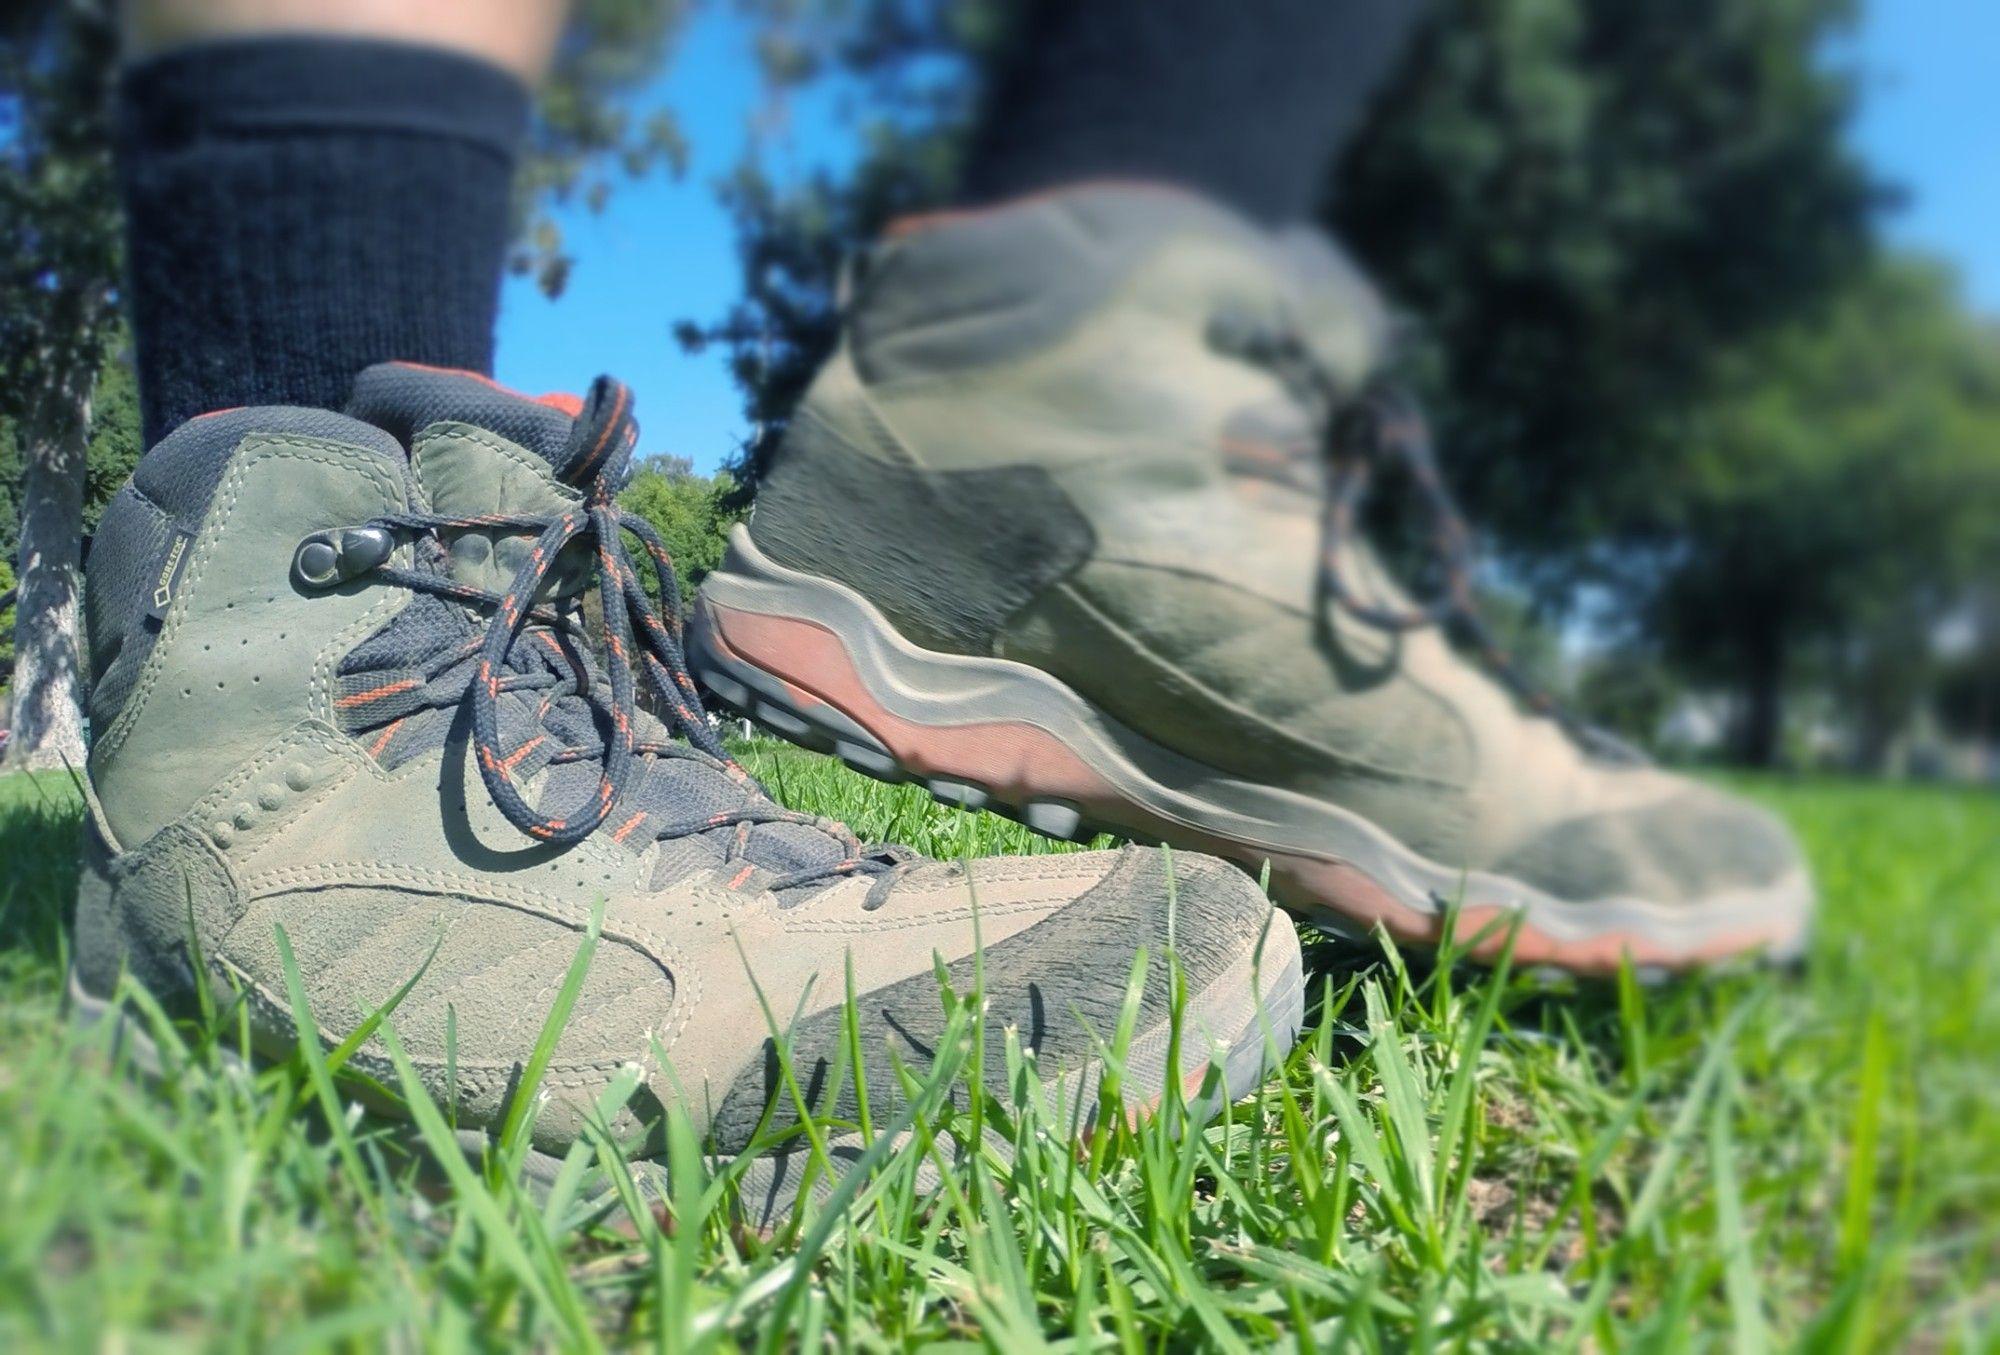 Gear Review Ecco Ulterra Mid Gtx Boot Socal Hiker Boots Outdoor Gear Mid